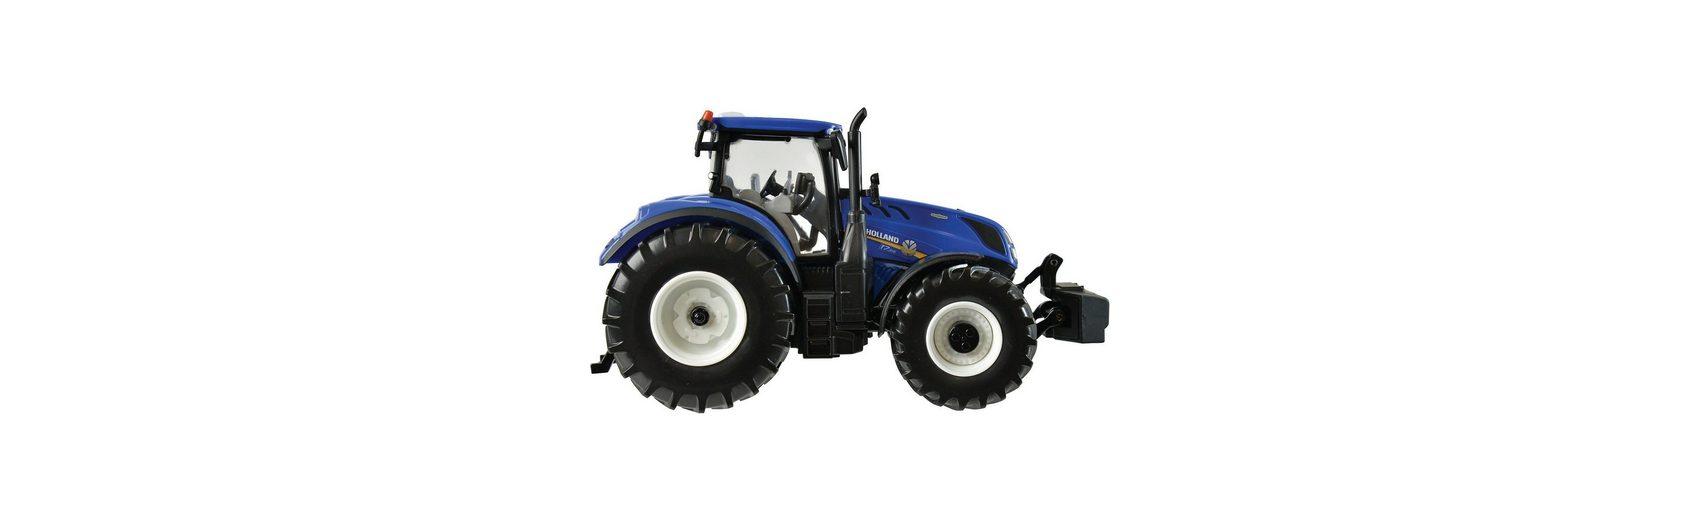 TOMY Britains - New Holland - T7.315 Traktor 1:32